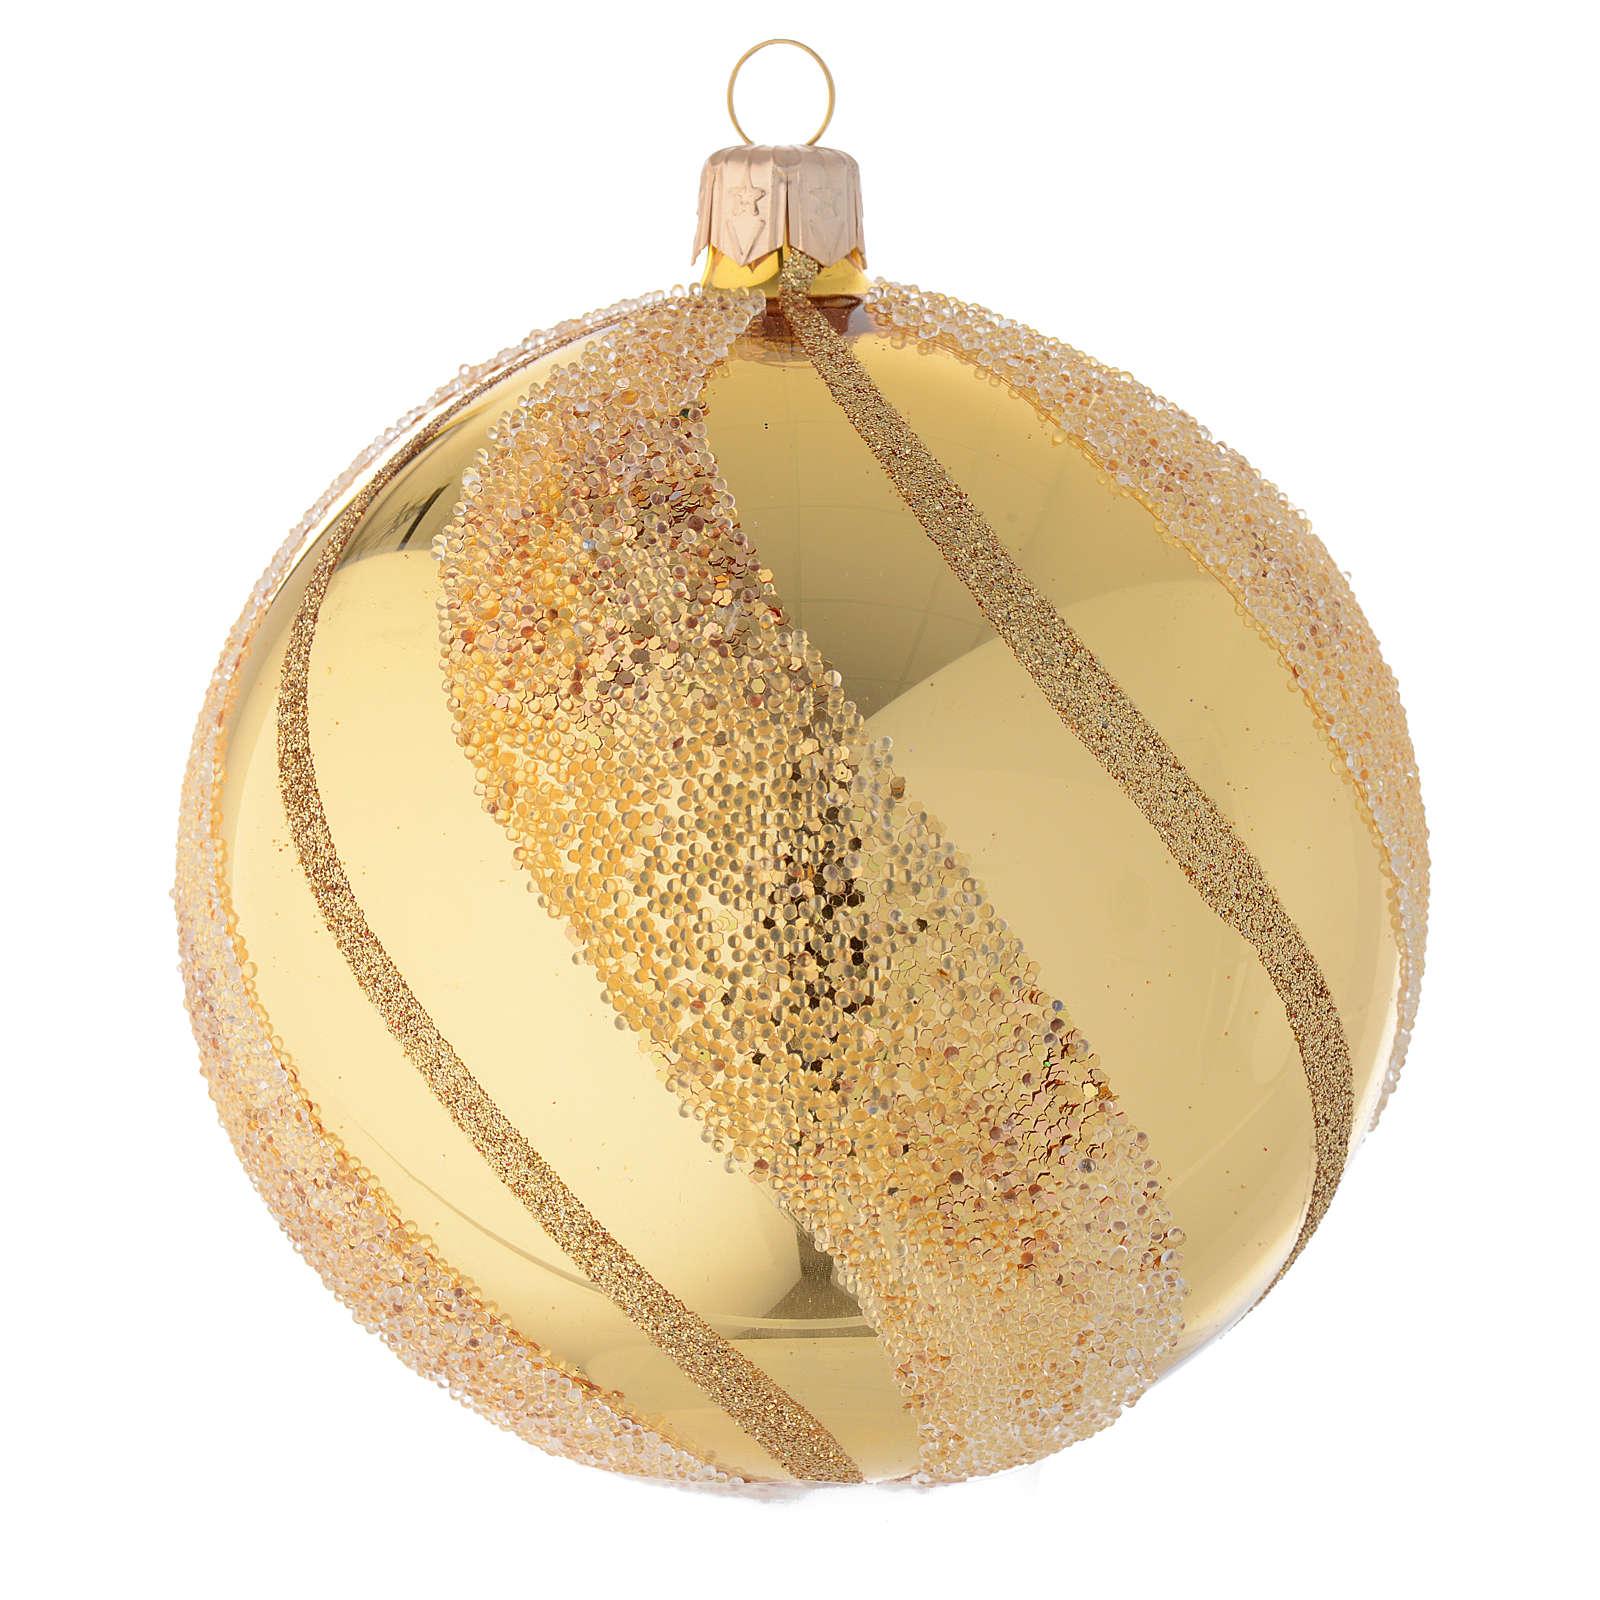 Adorno de Navidad bola de vidrio oro con glitters 100 mm 4